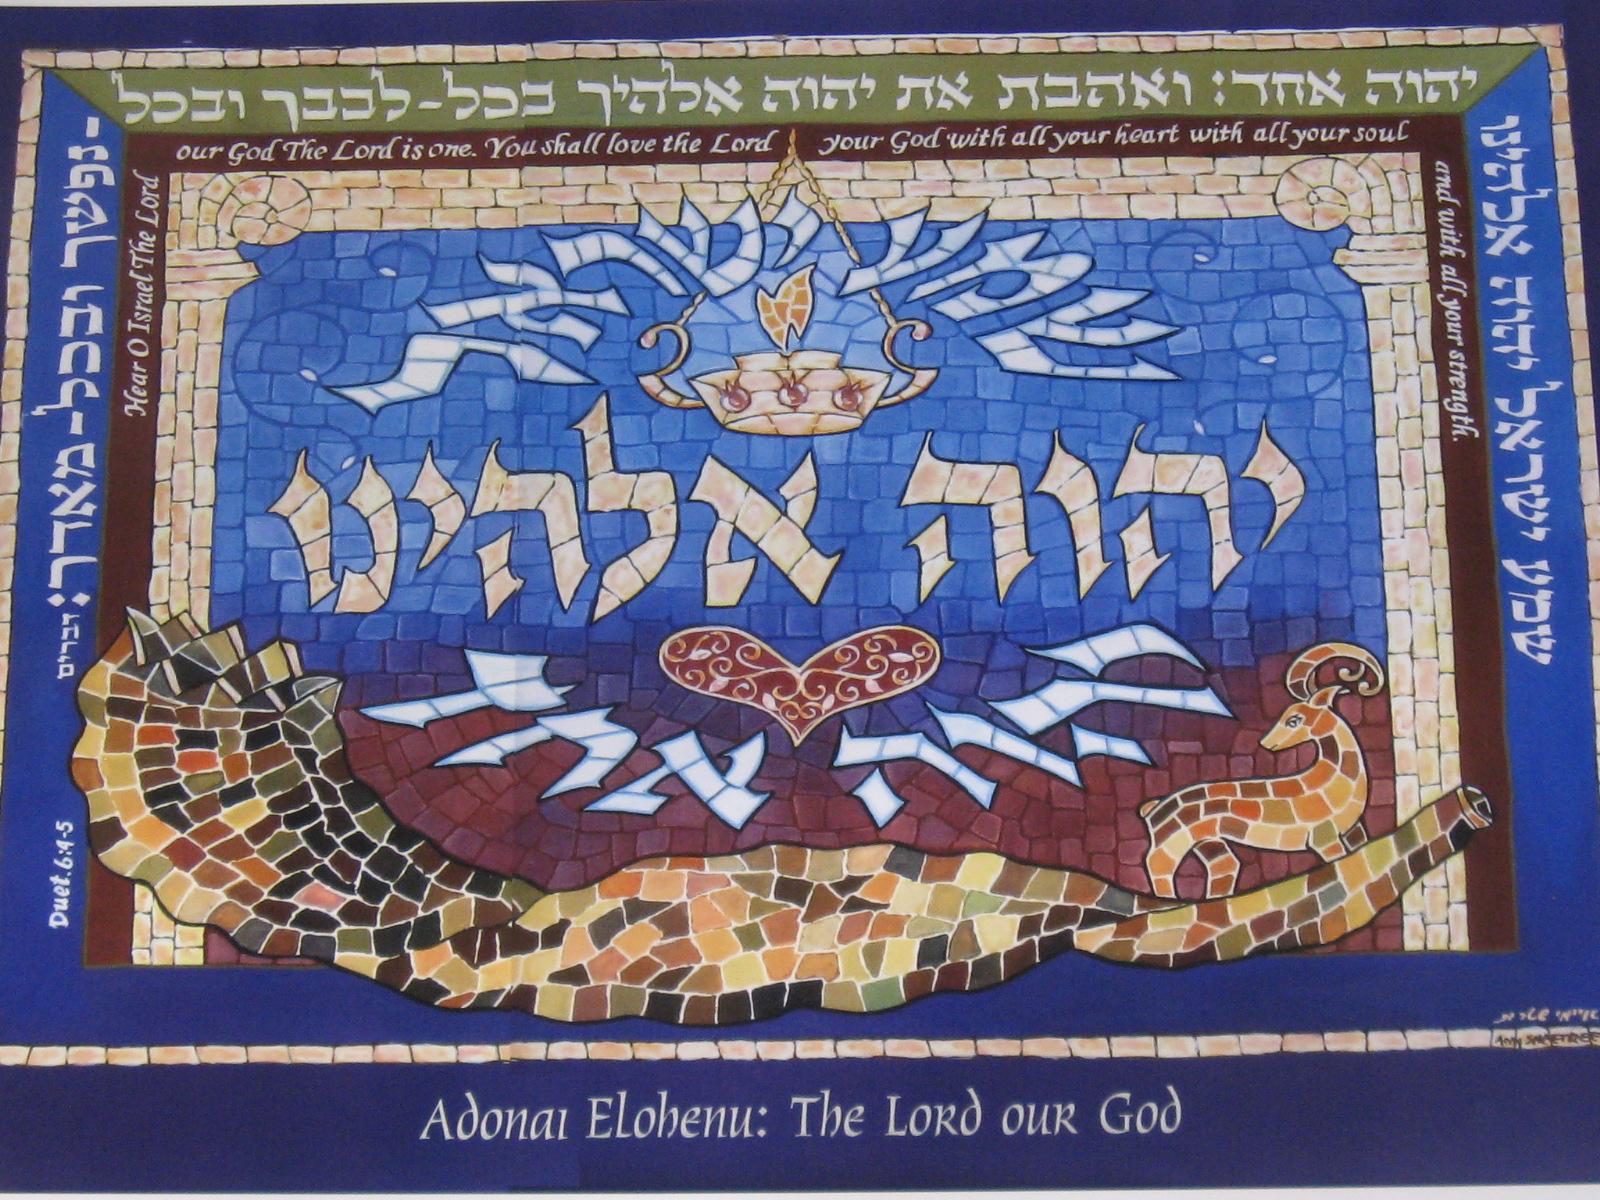 Love For His People: Sh'ma (Shema) Israel